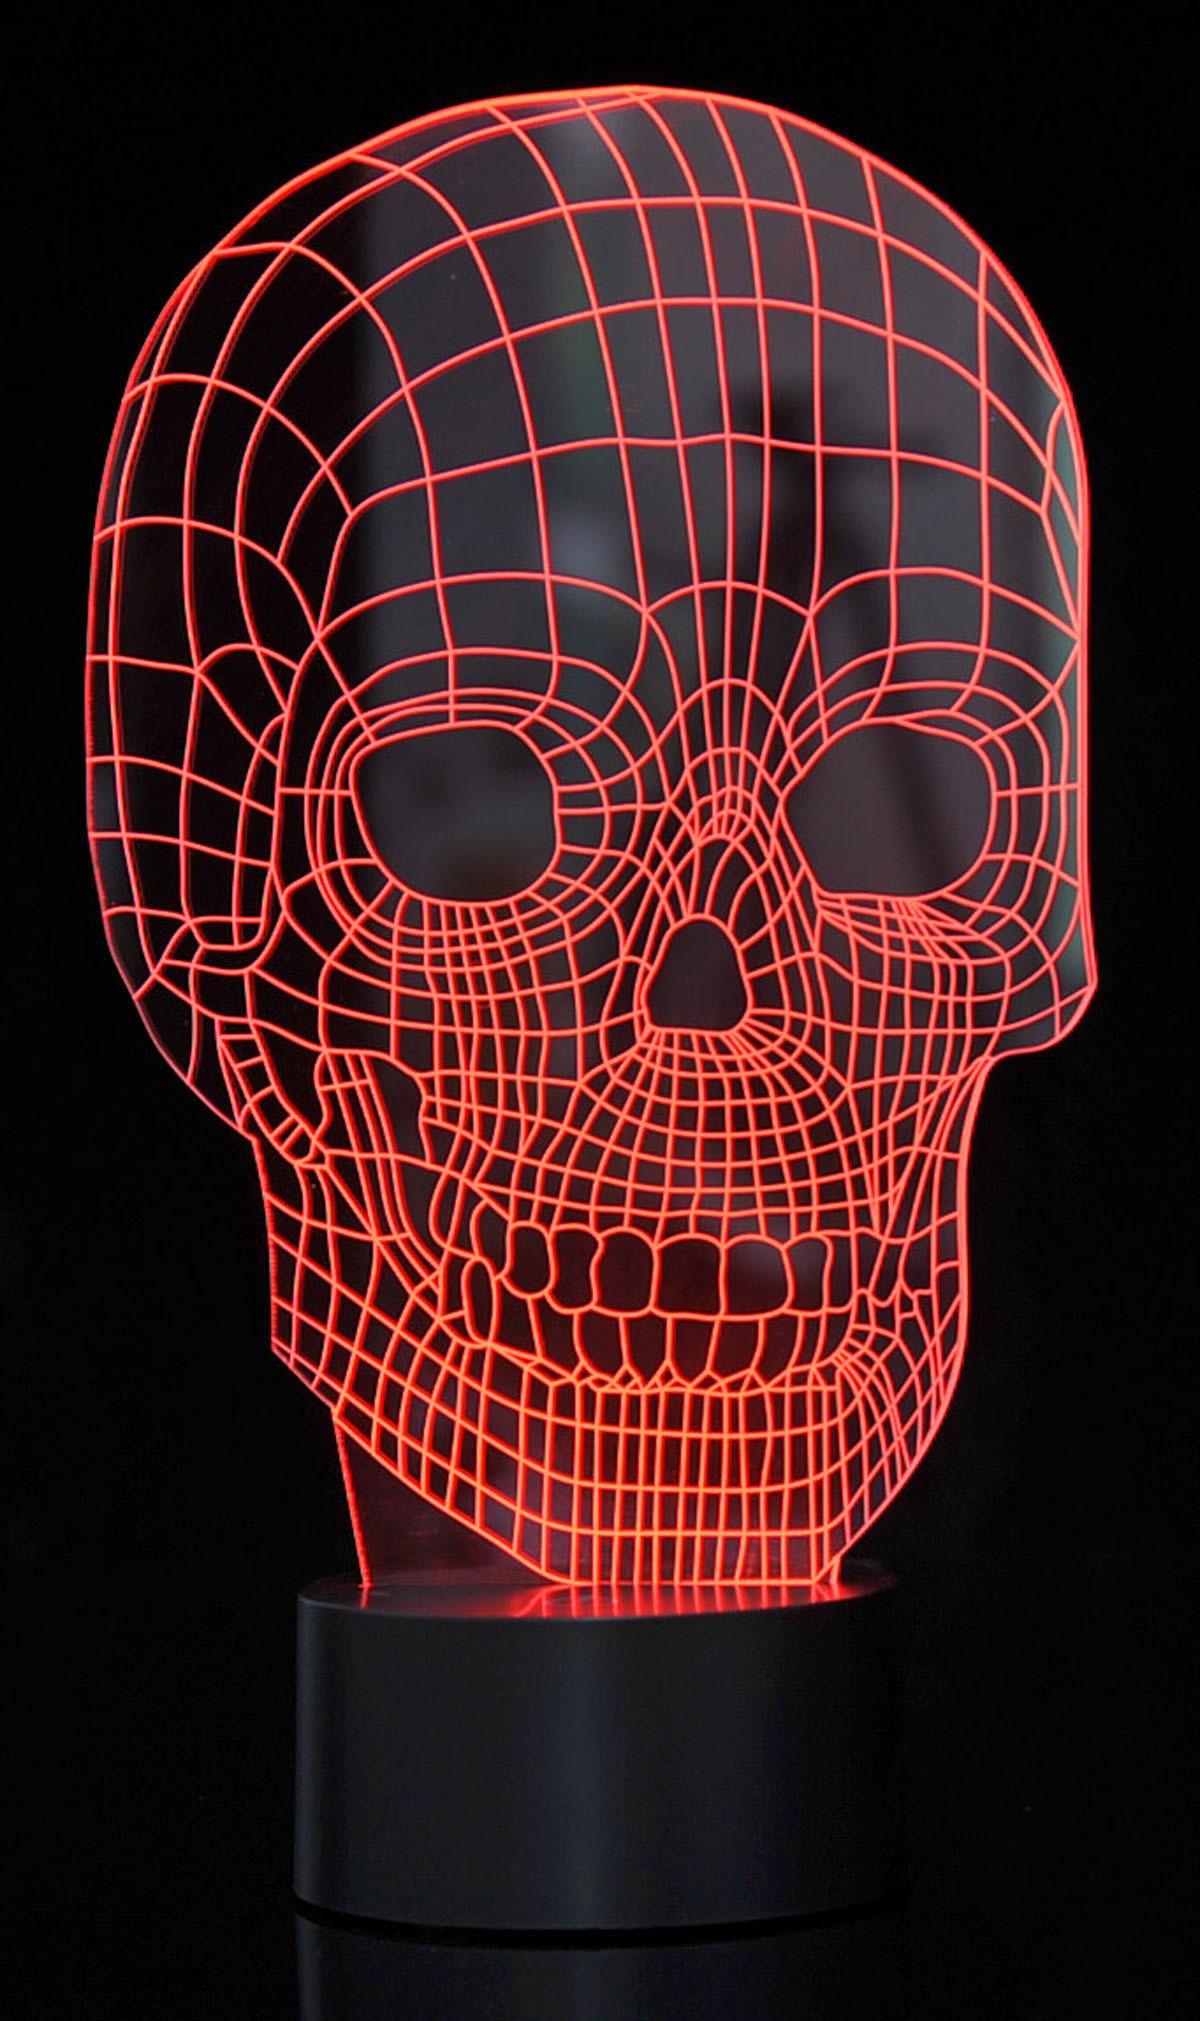 3D Skull Laser Cut Precision LED Lights